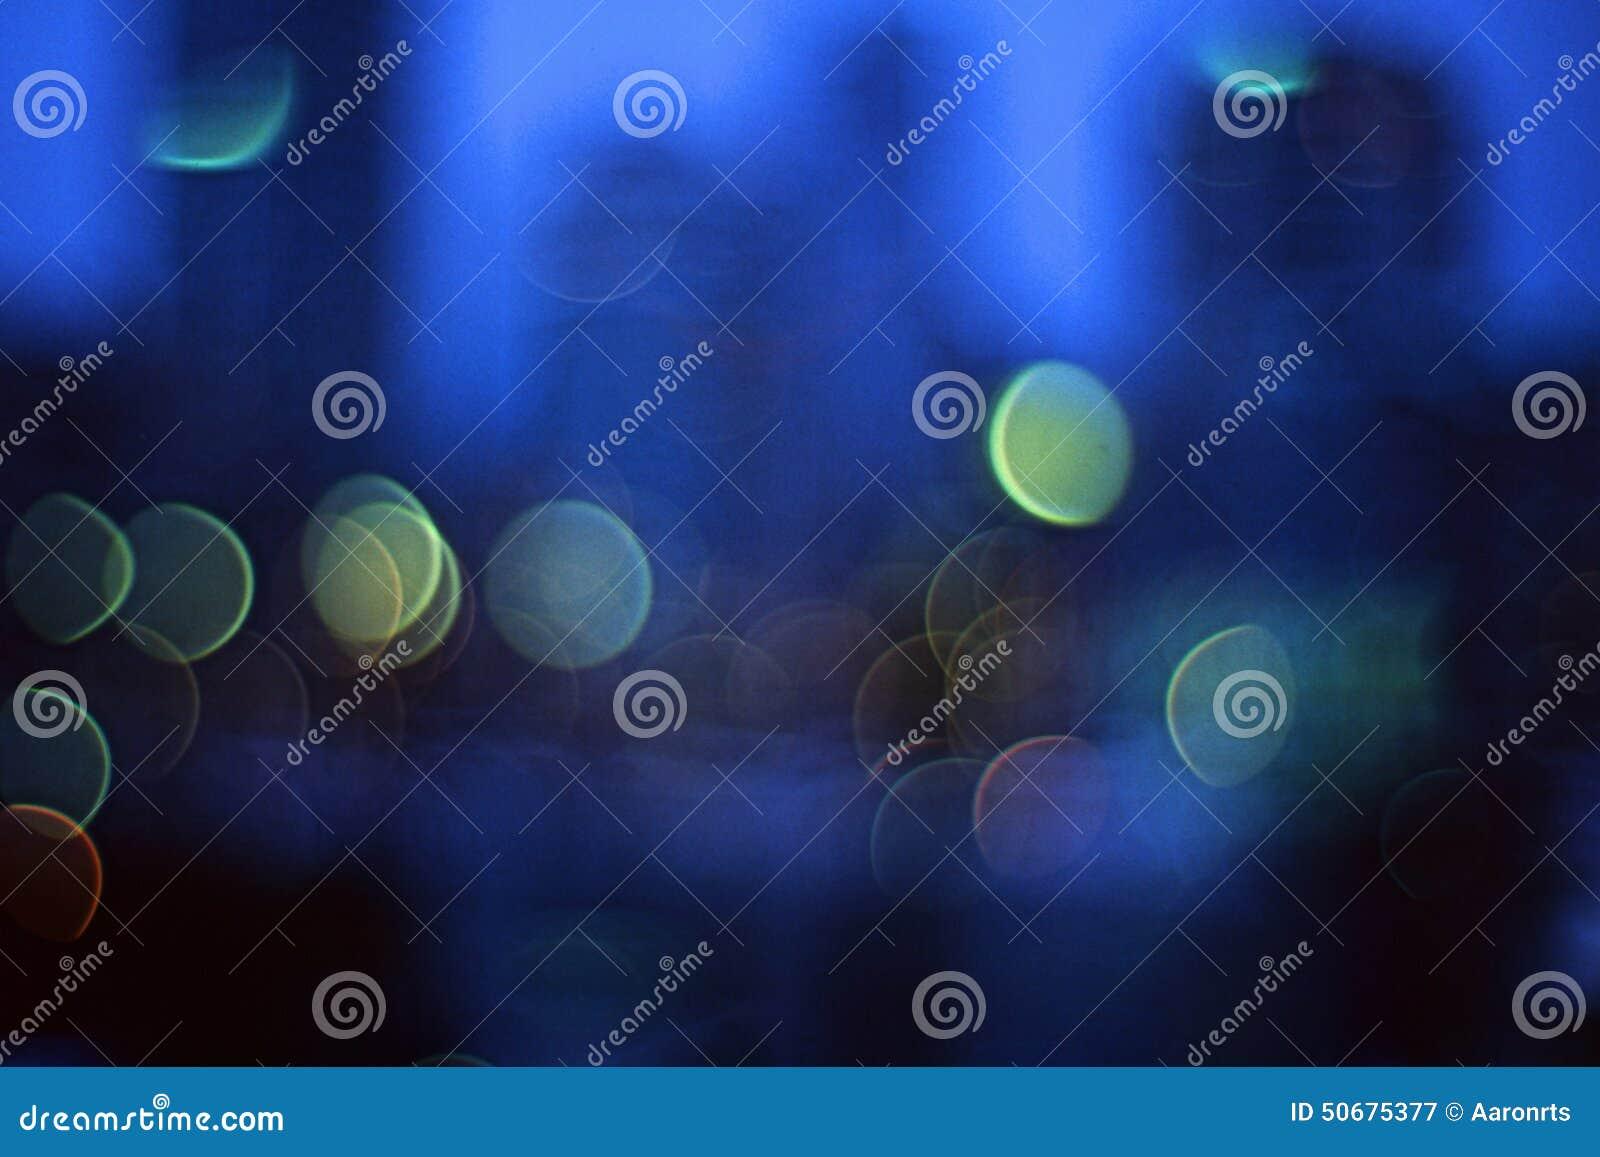 Download 晚上温哥华 库存图片. 图片 包括有 港口, 蓝色, 温哥华, 影片, 富士, 晚上, 查找 - 50675377